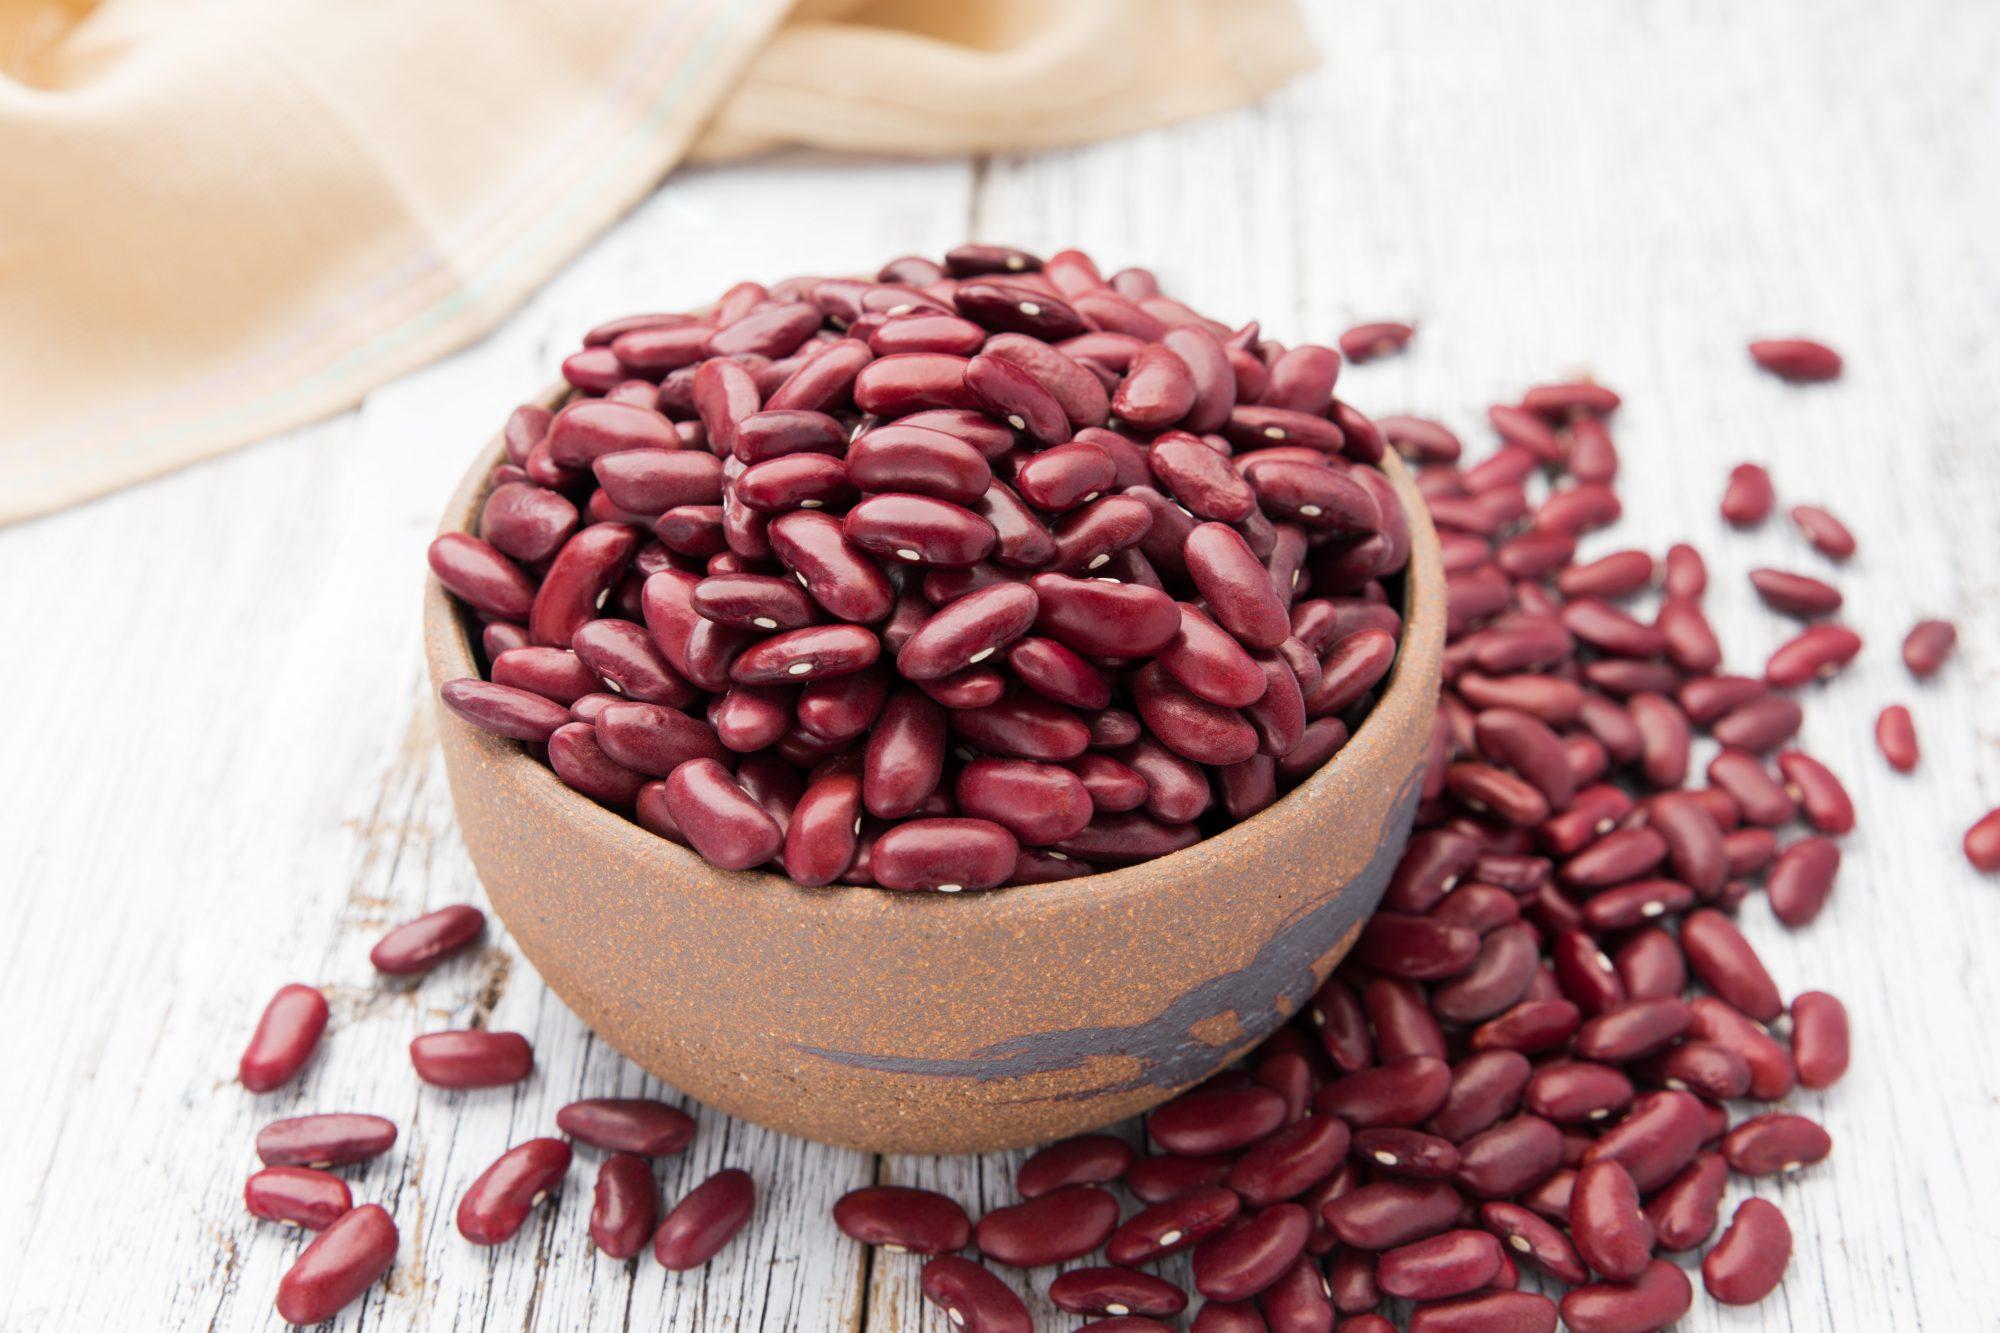 Beans Getty 1/21/20